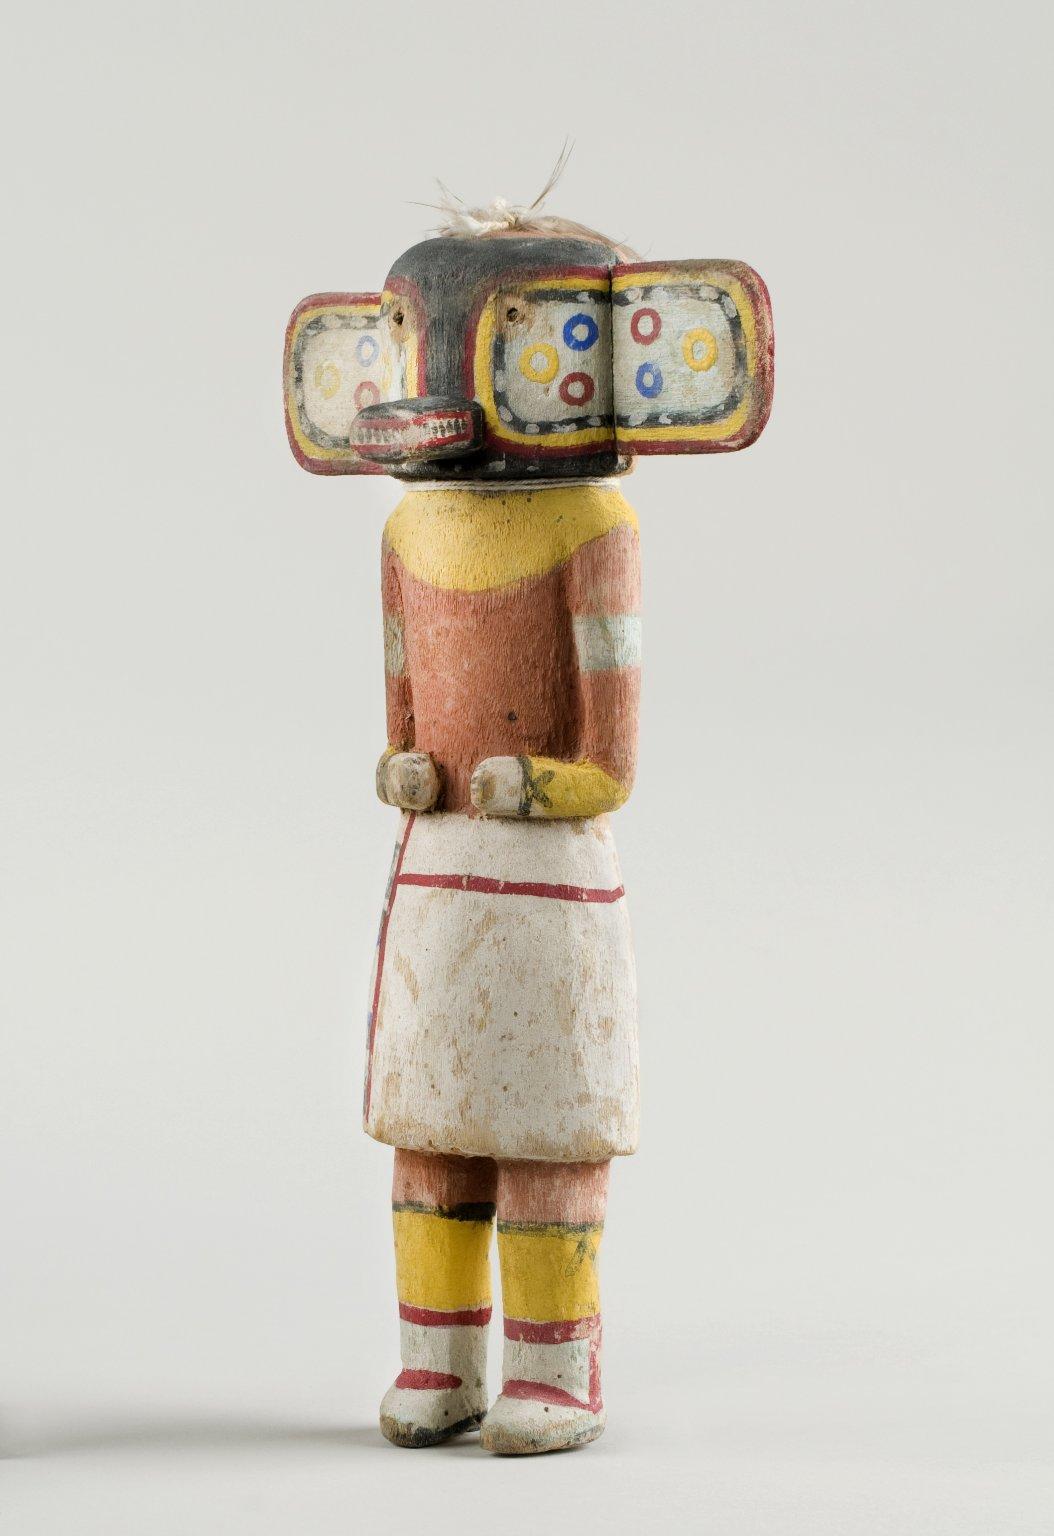 Hololo Kachina Doll